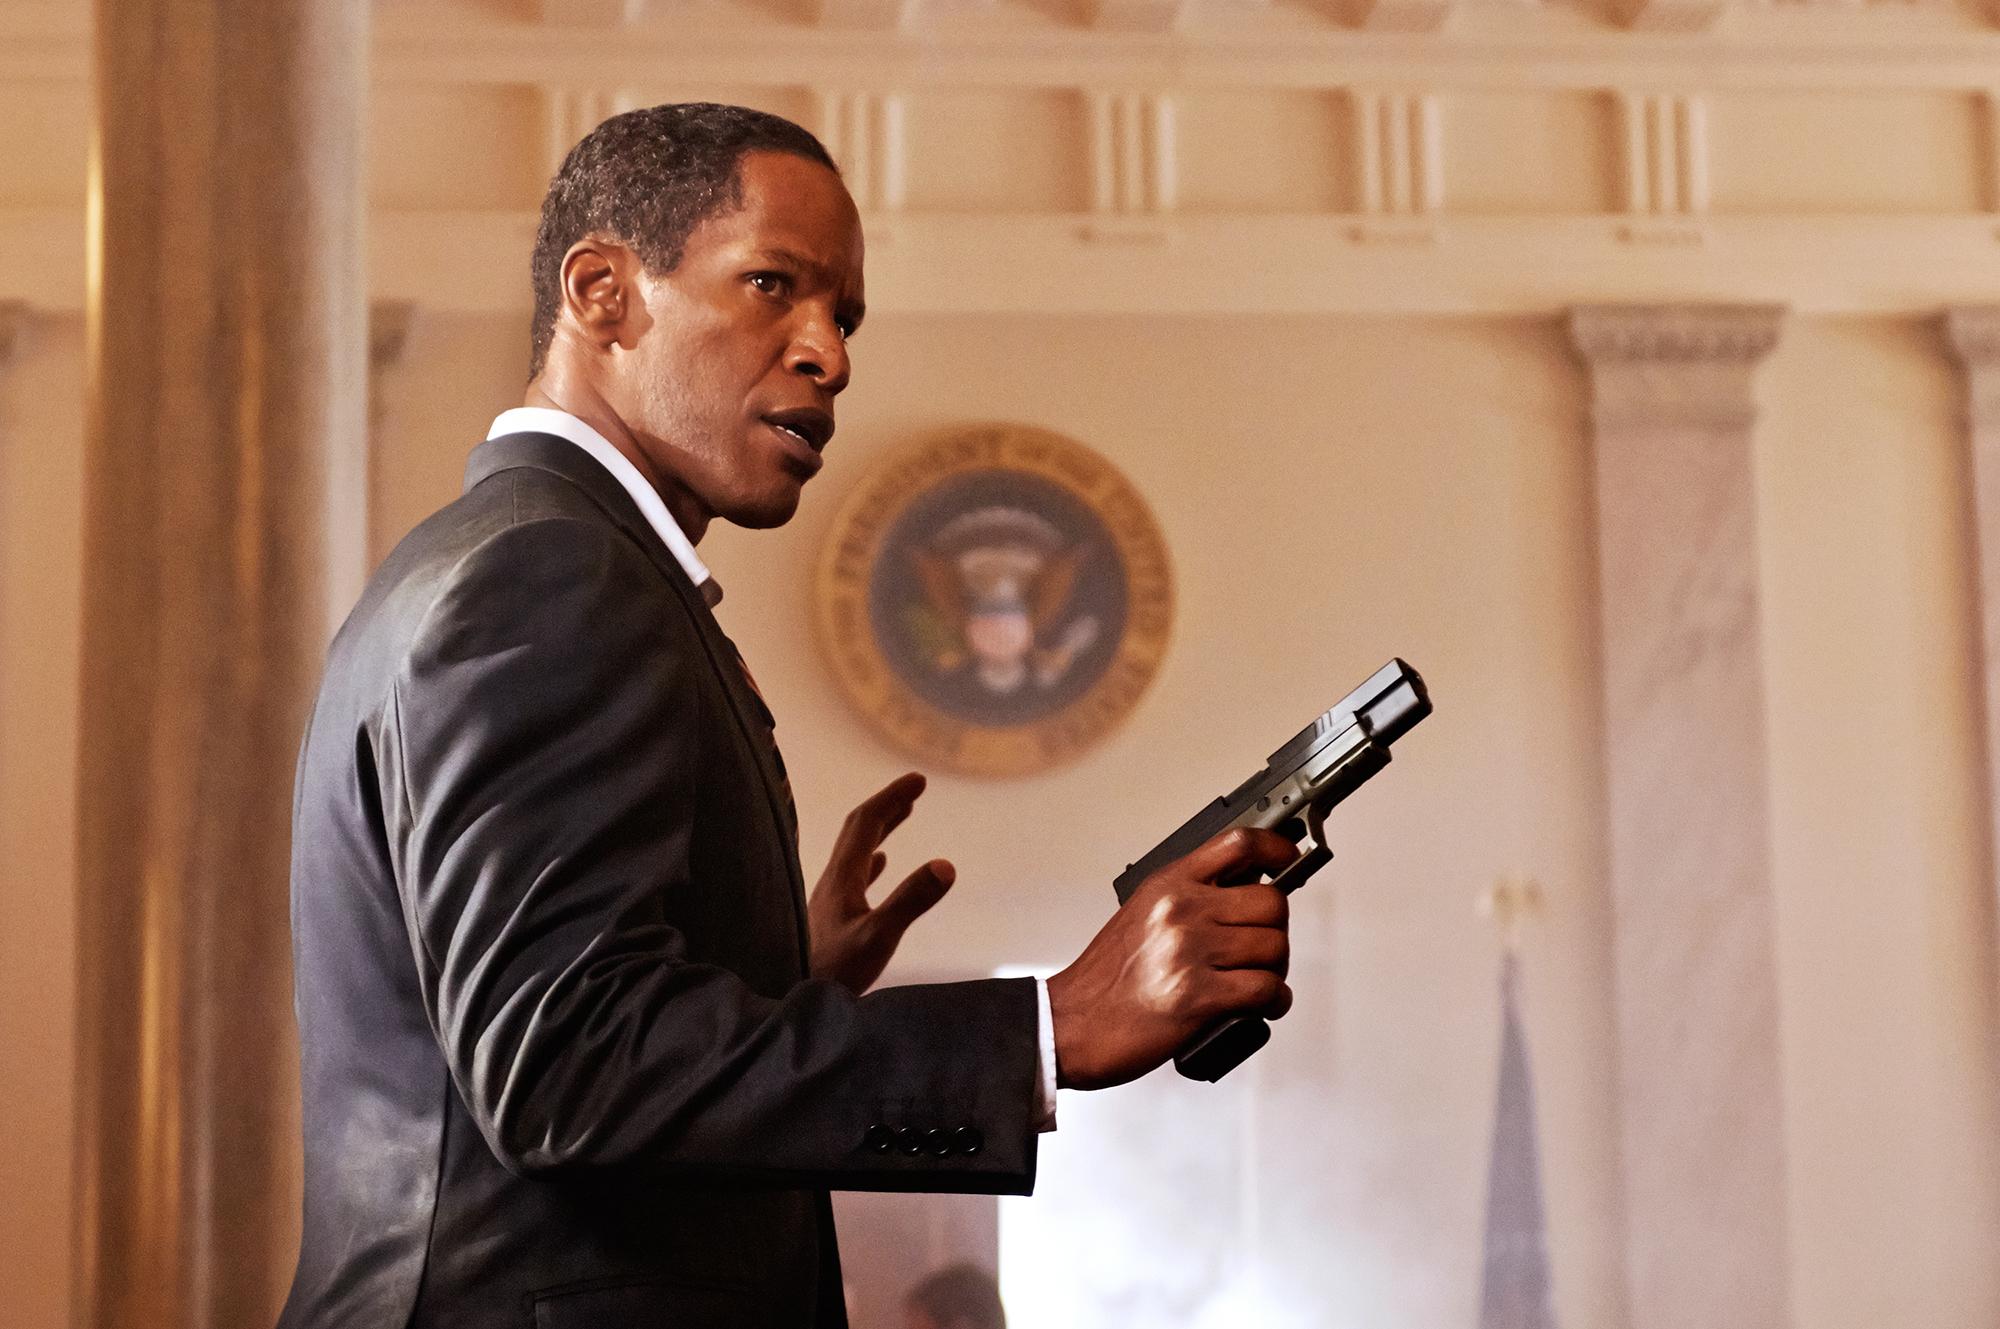 Jamie Foxx as James William Sawyer in White House Down, 2013.